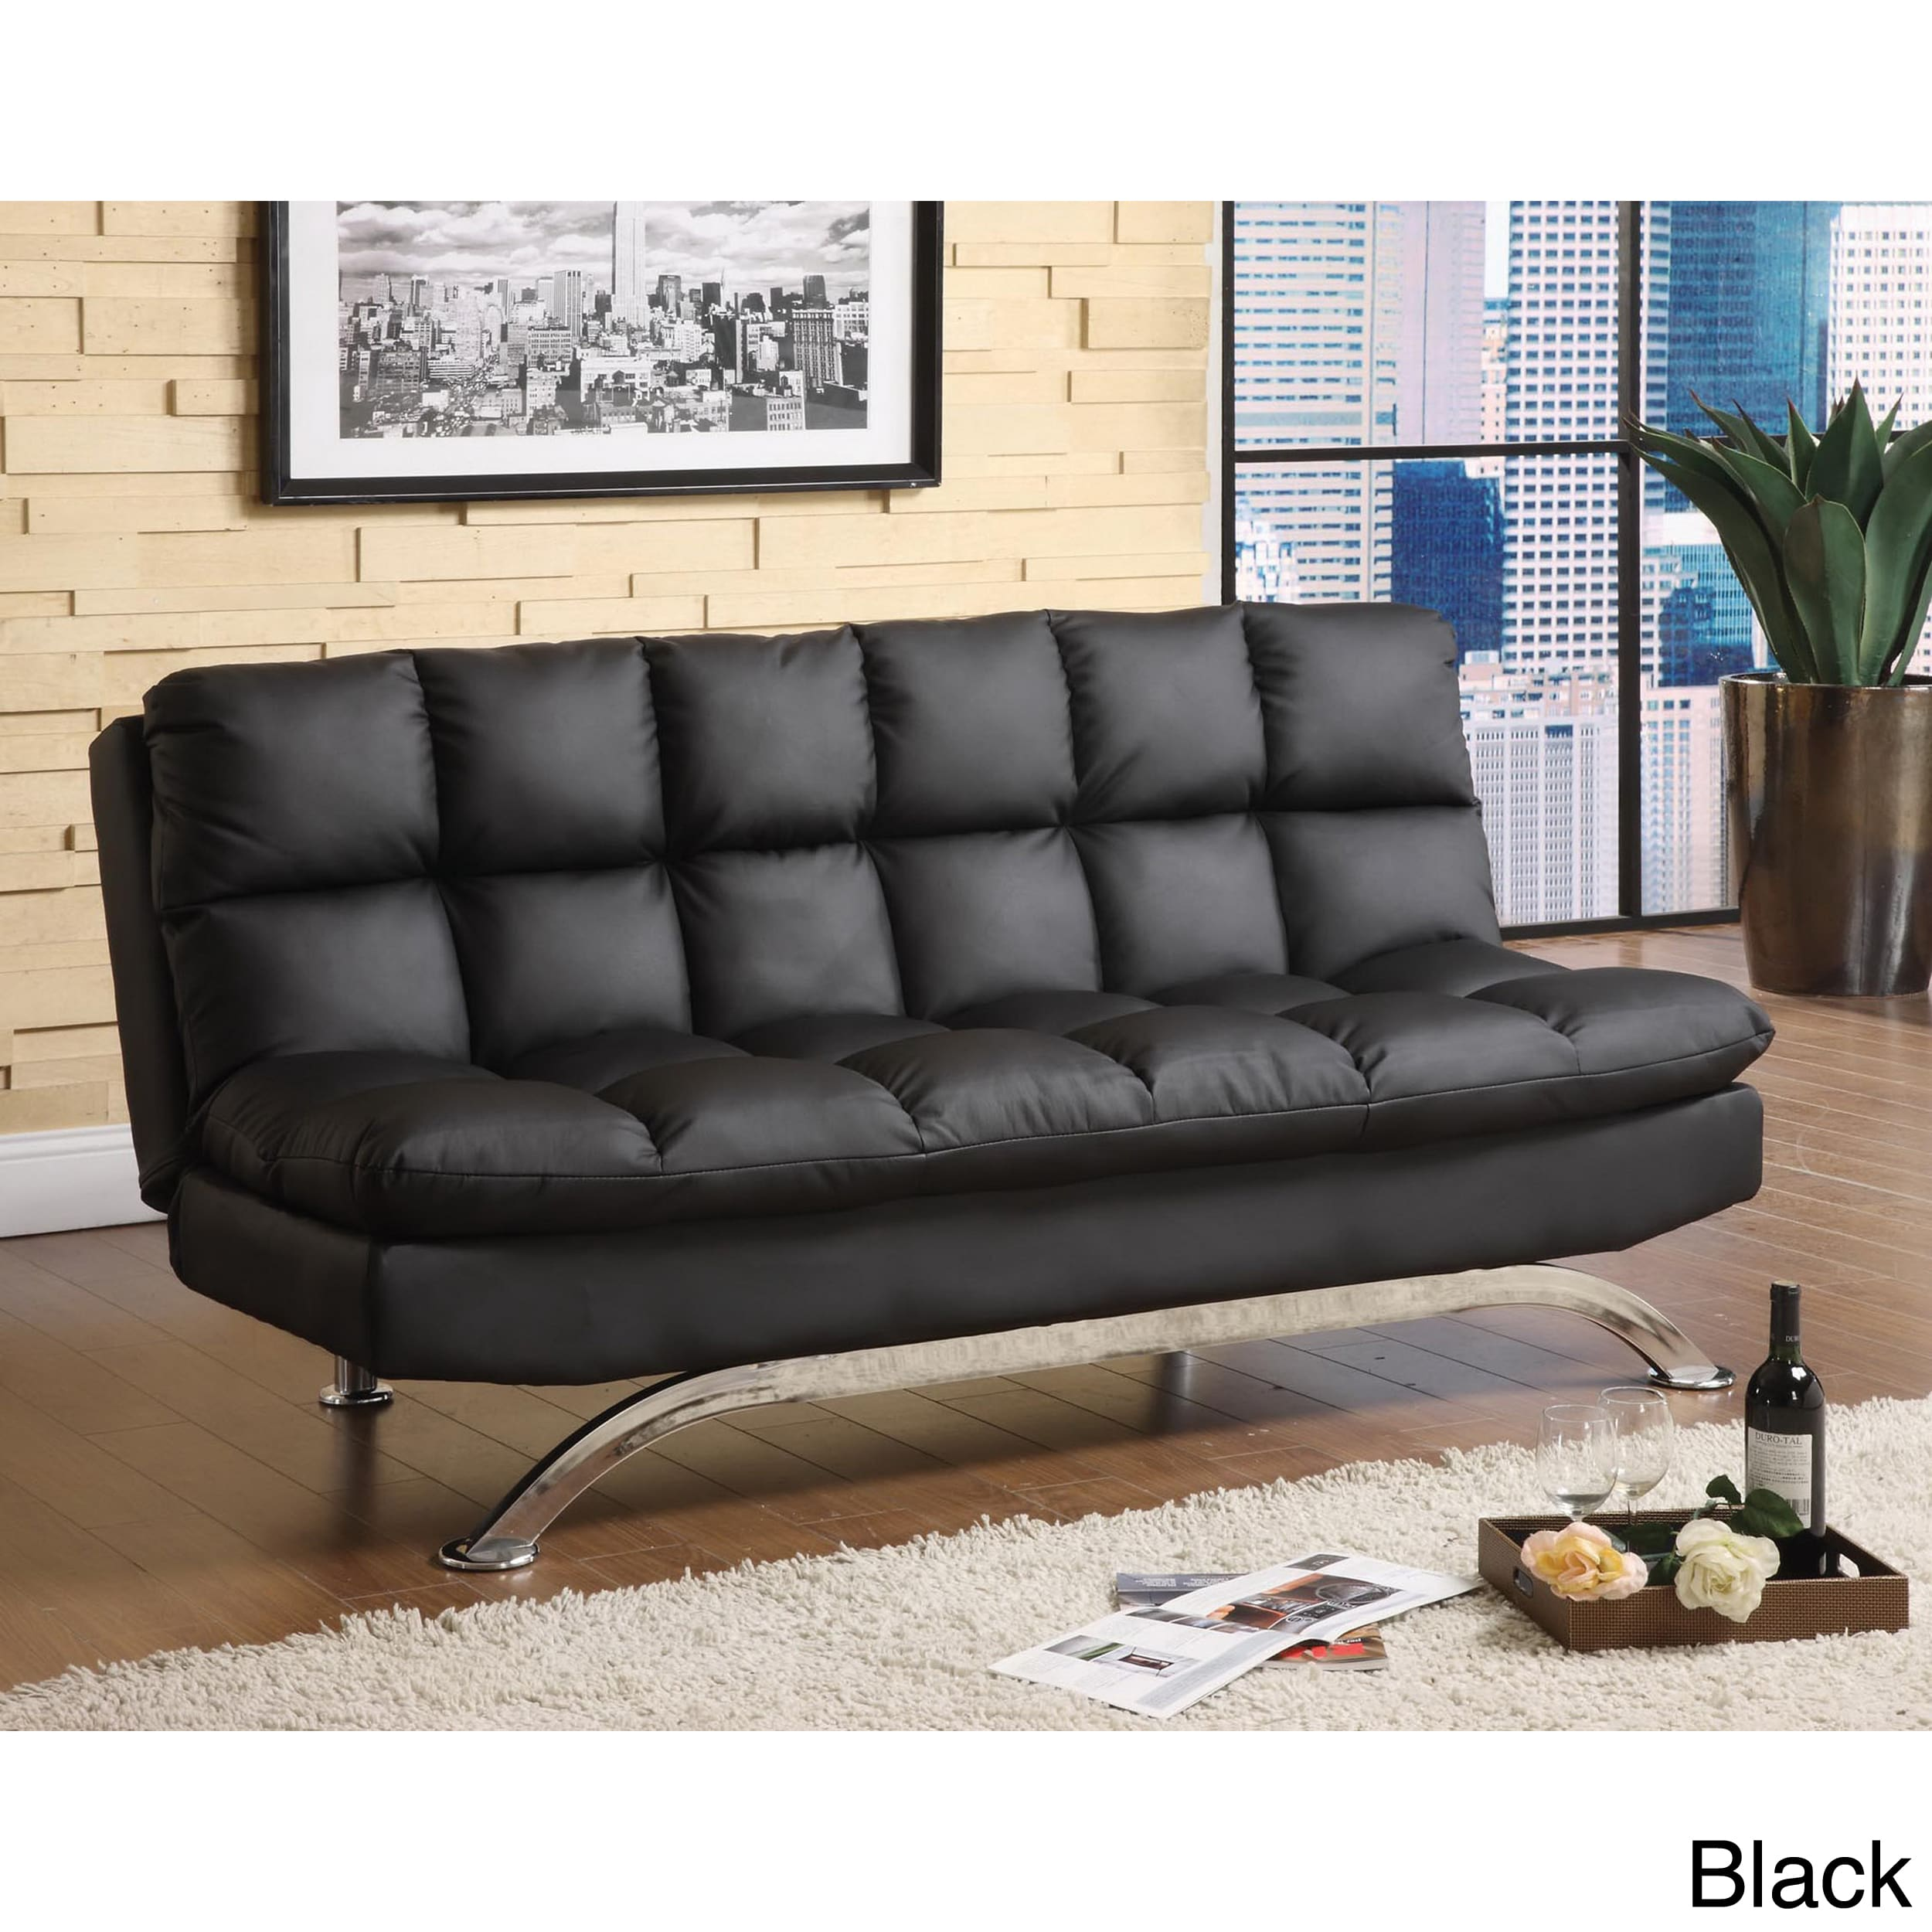 Furniture of America Pascoe Bicast Leather Sofa/ Futon - Walmart.com